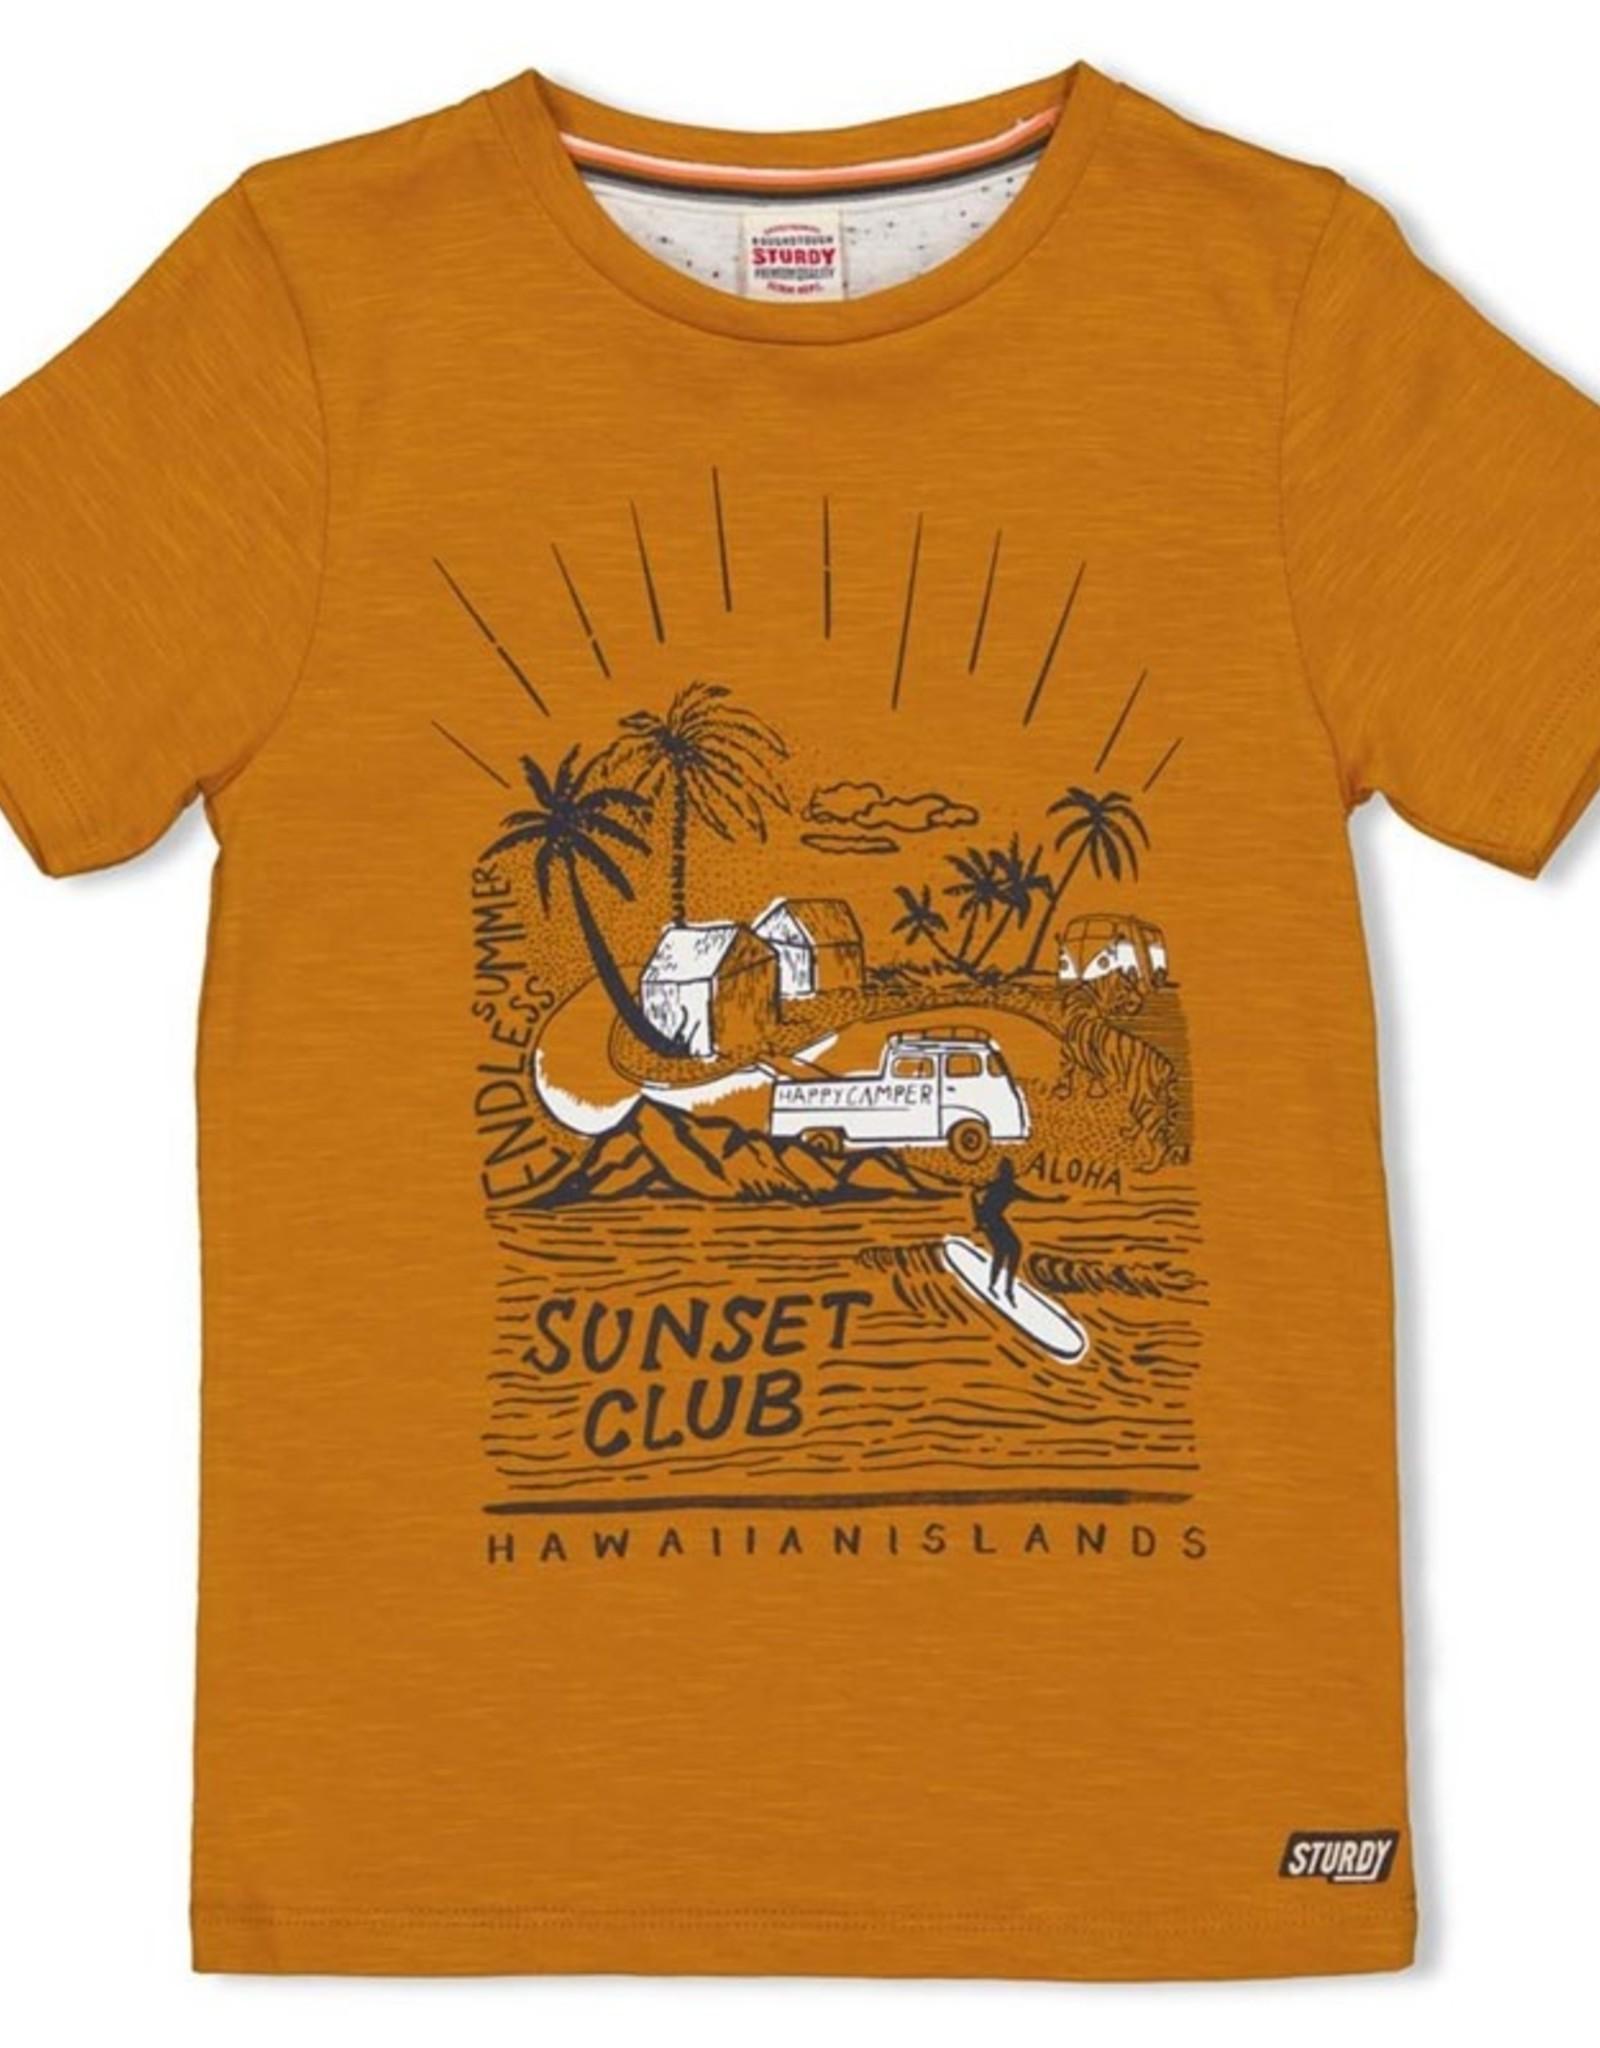 Sturdy Sturdy okergeel t-shirt met zomerse opdruk